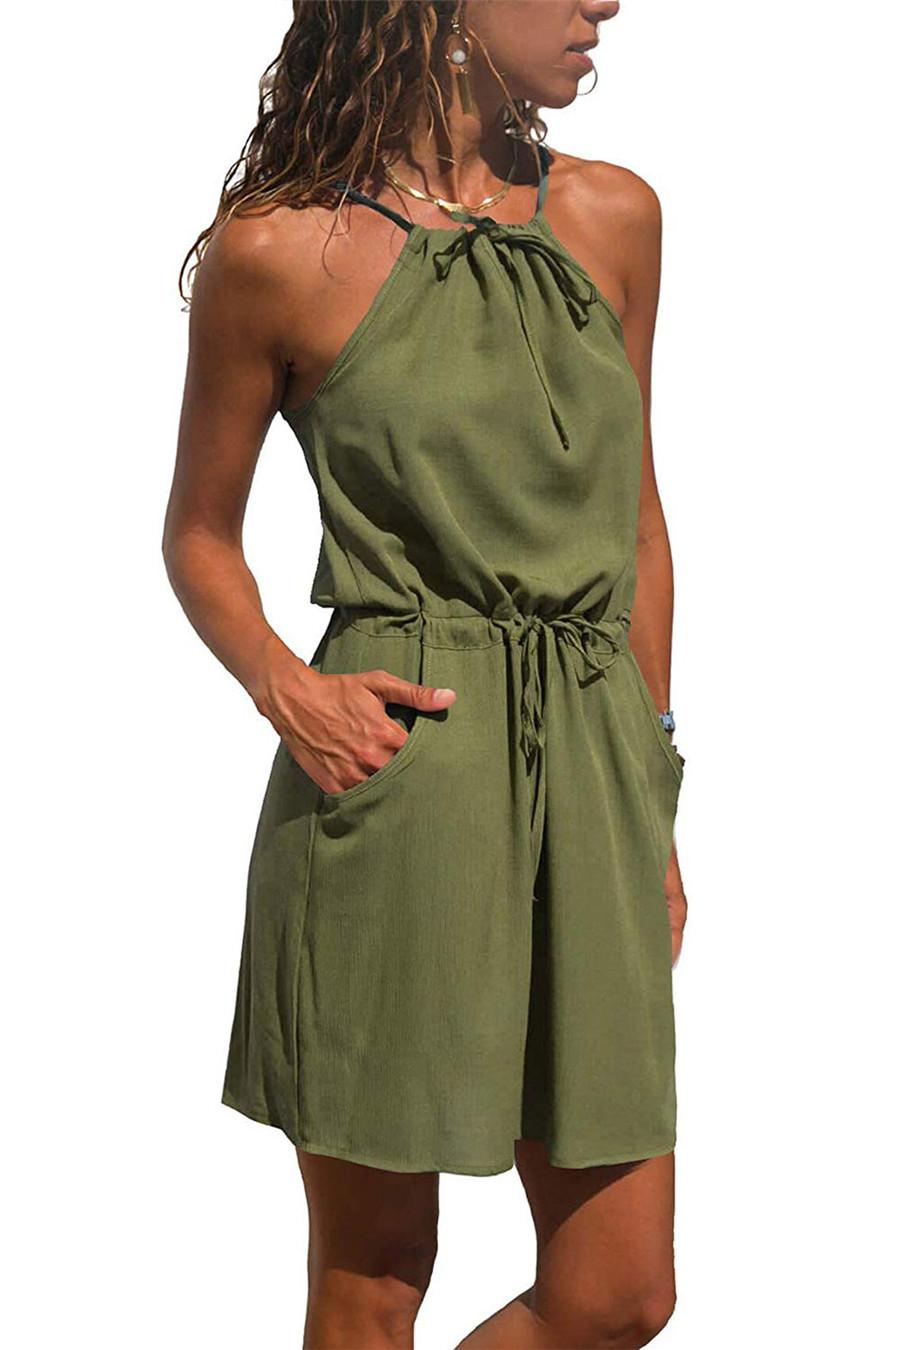 Gladiolus Chiffon Women Summer Dress Spaghetti Strap Floral Print Pocket Sexy Bohemian Beach Dress 2019 Short Ladies Dresses (48)